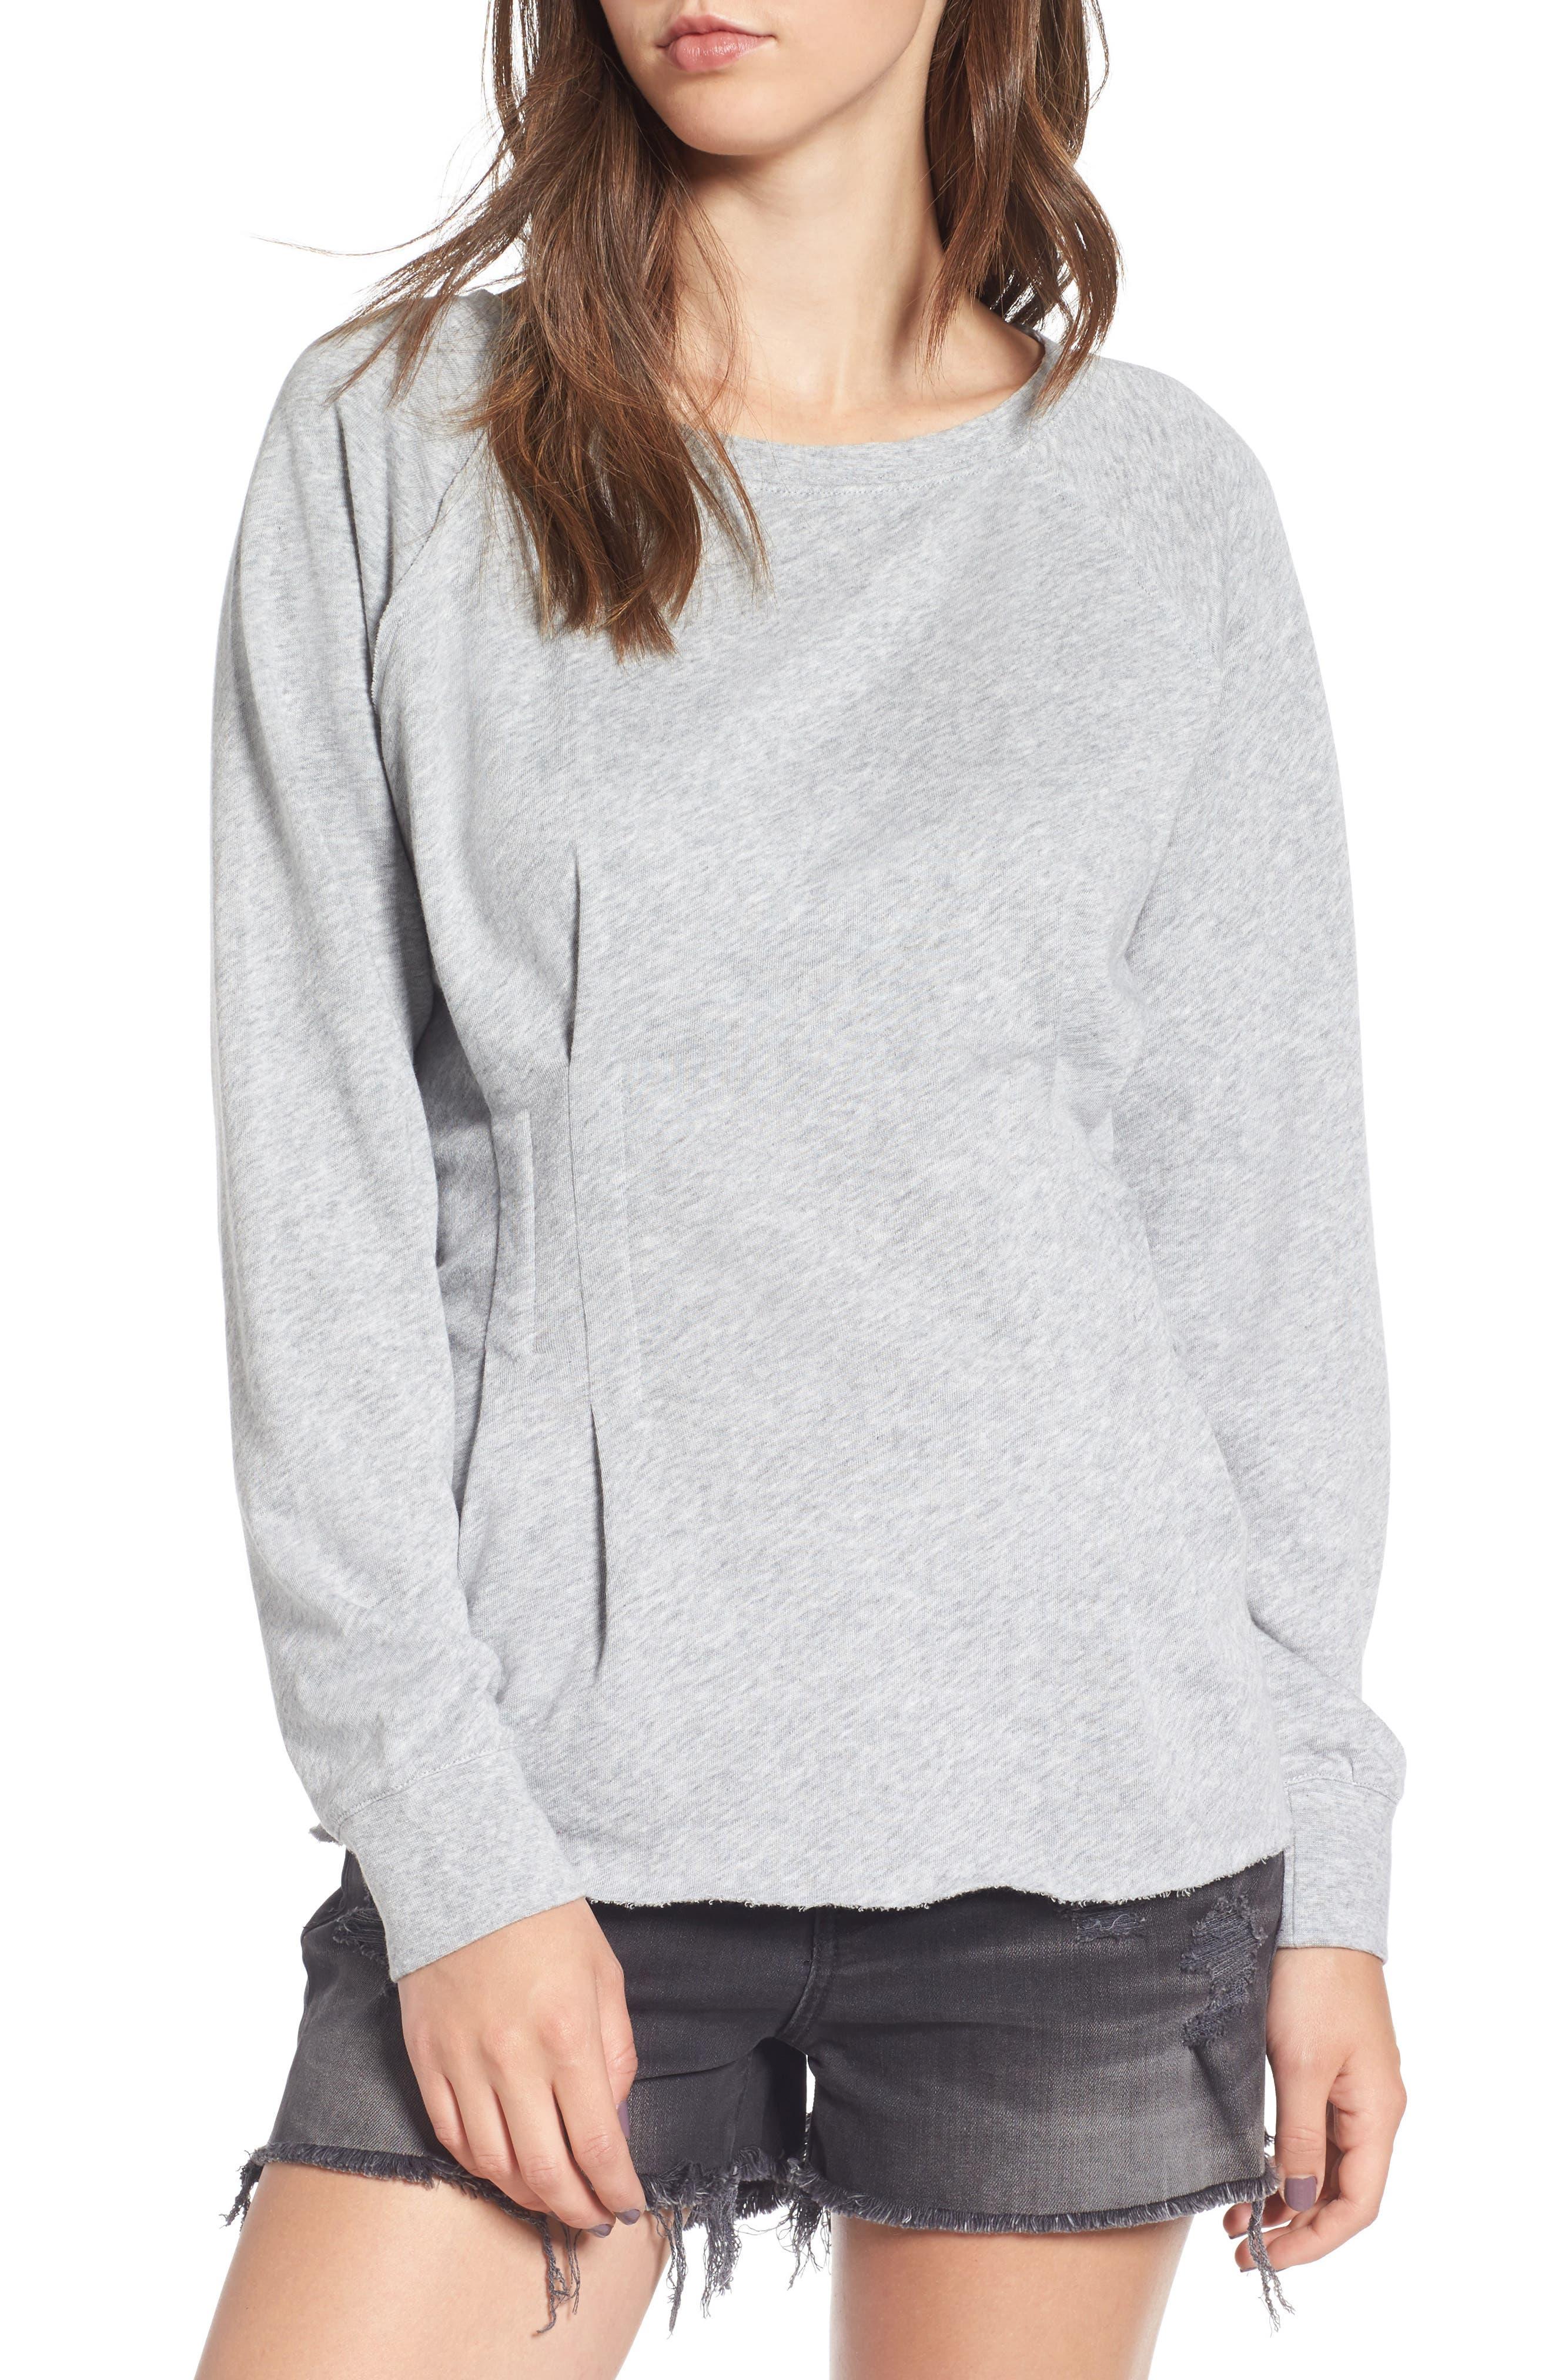 Cinch Waist Sweatshirt,                             Main thumbnail 1, color,                             020